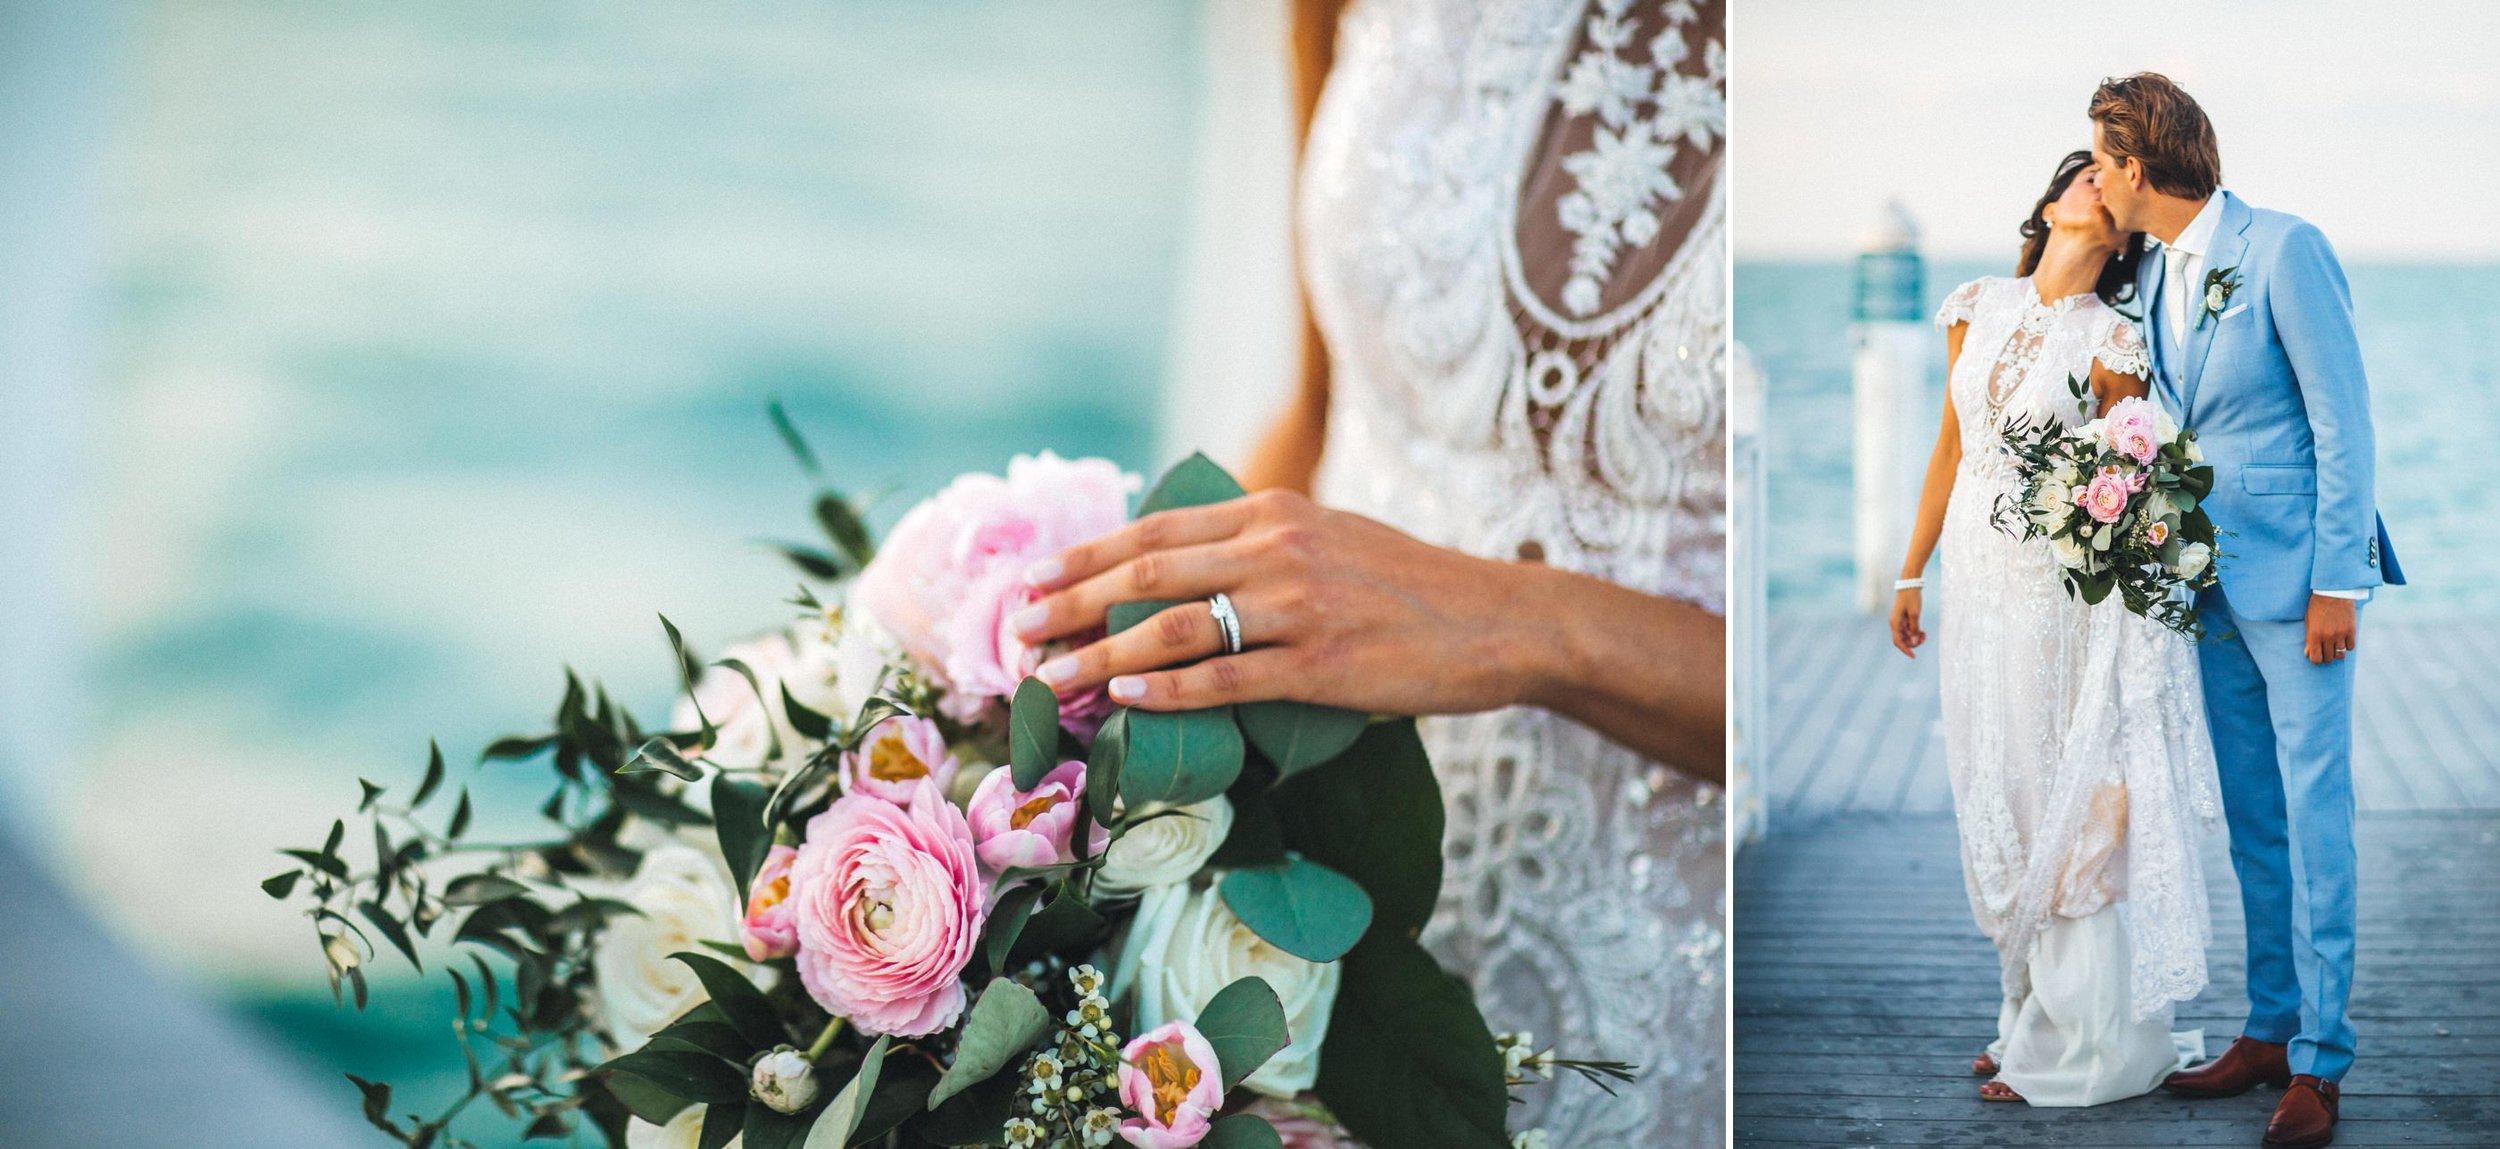 Captiva Island Destination Elopement Wedding Photography-blog- Zohra+David-by-Shaina-DeCiryan26.jpg